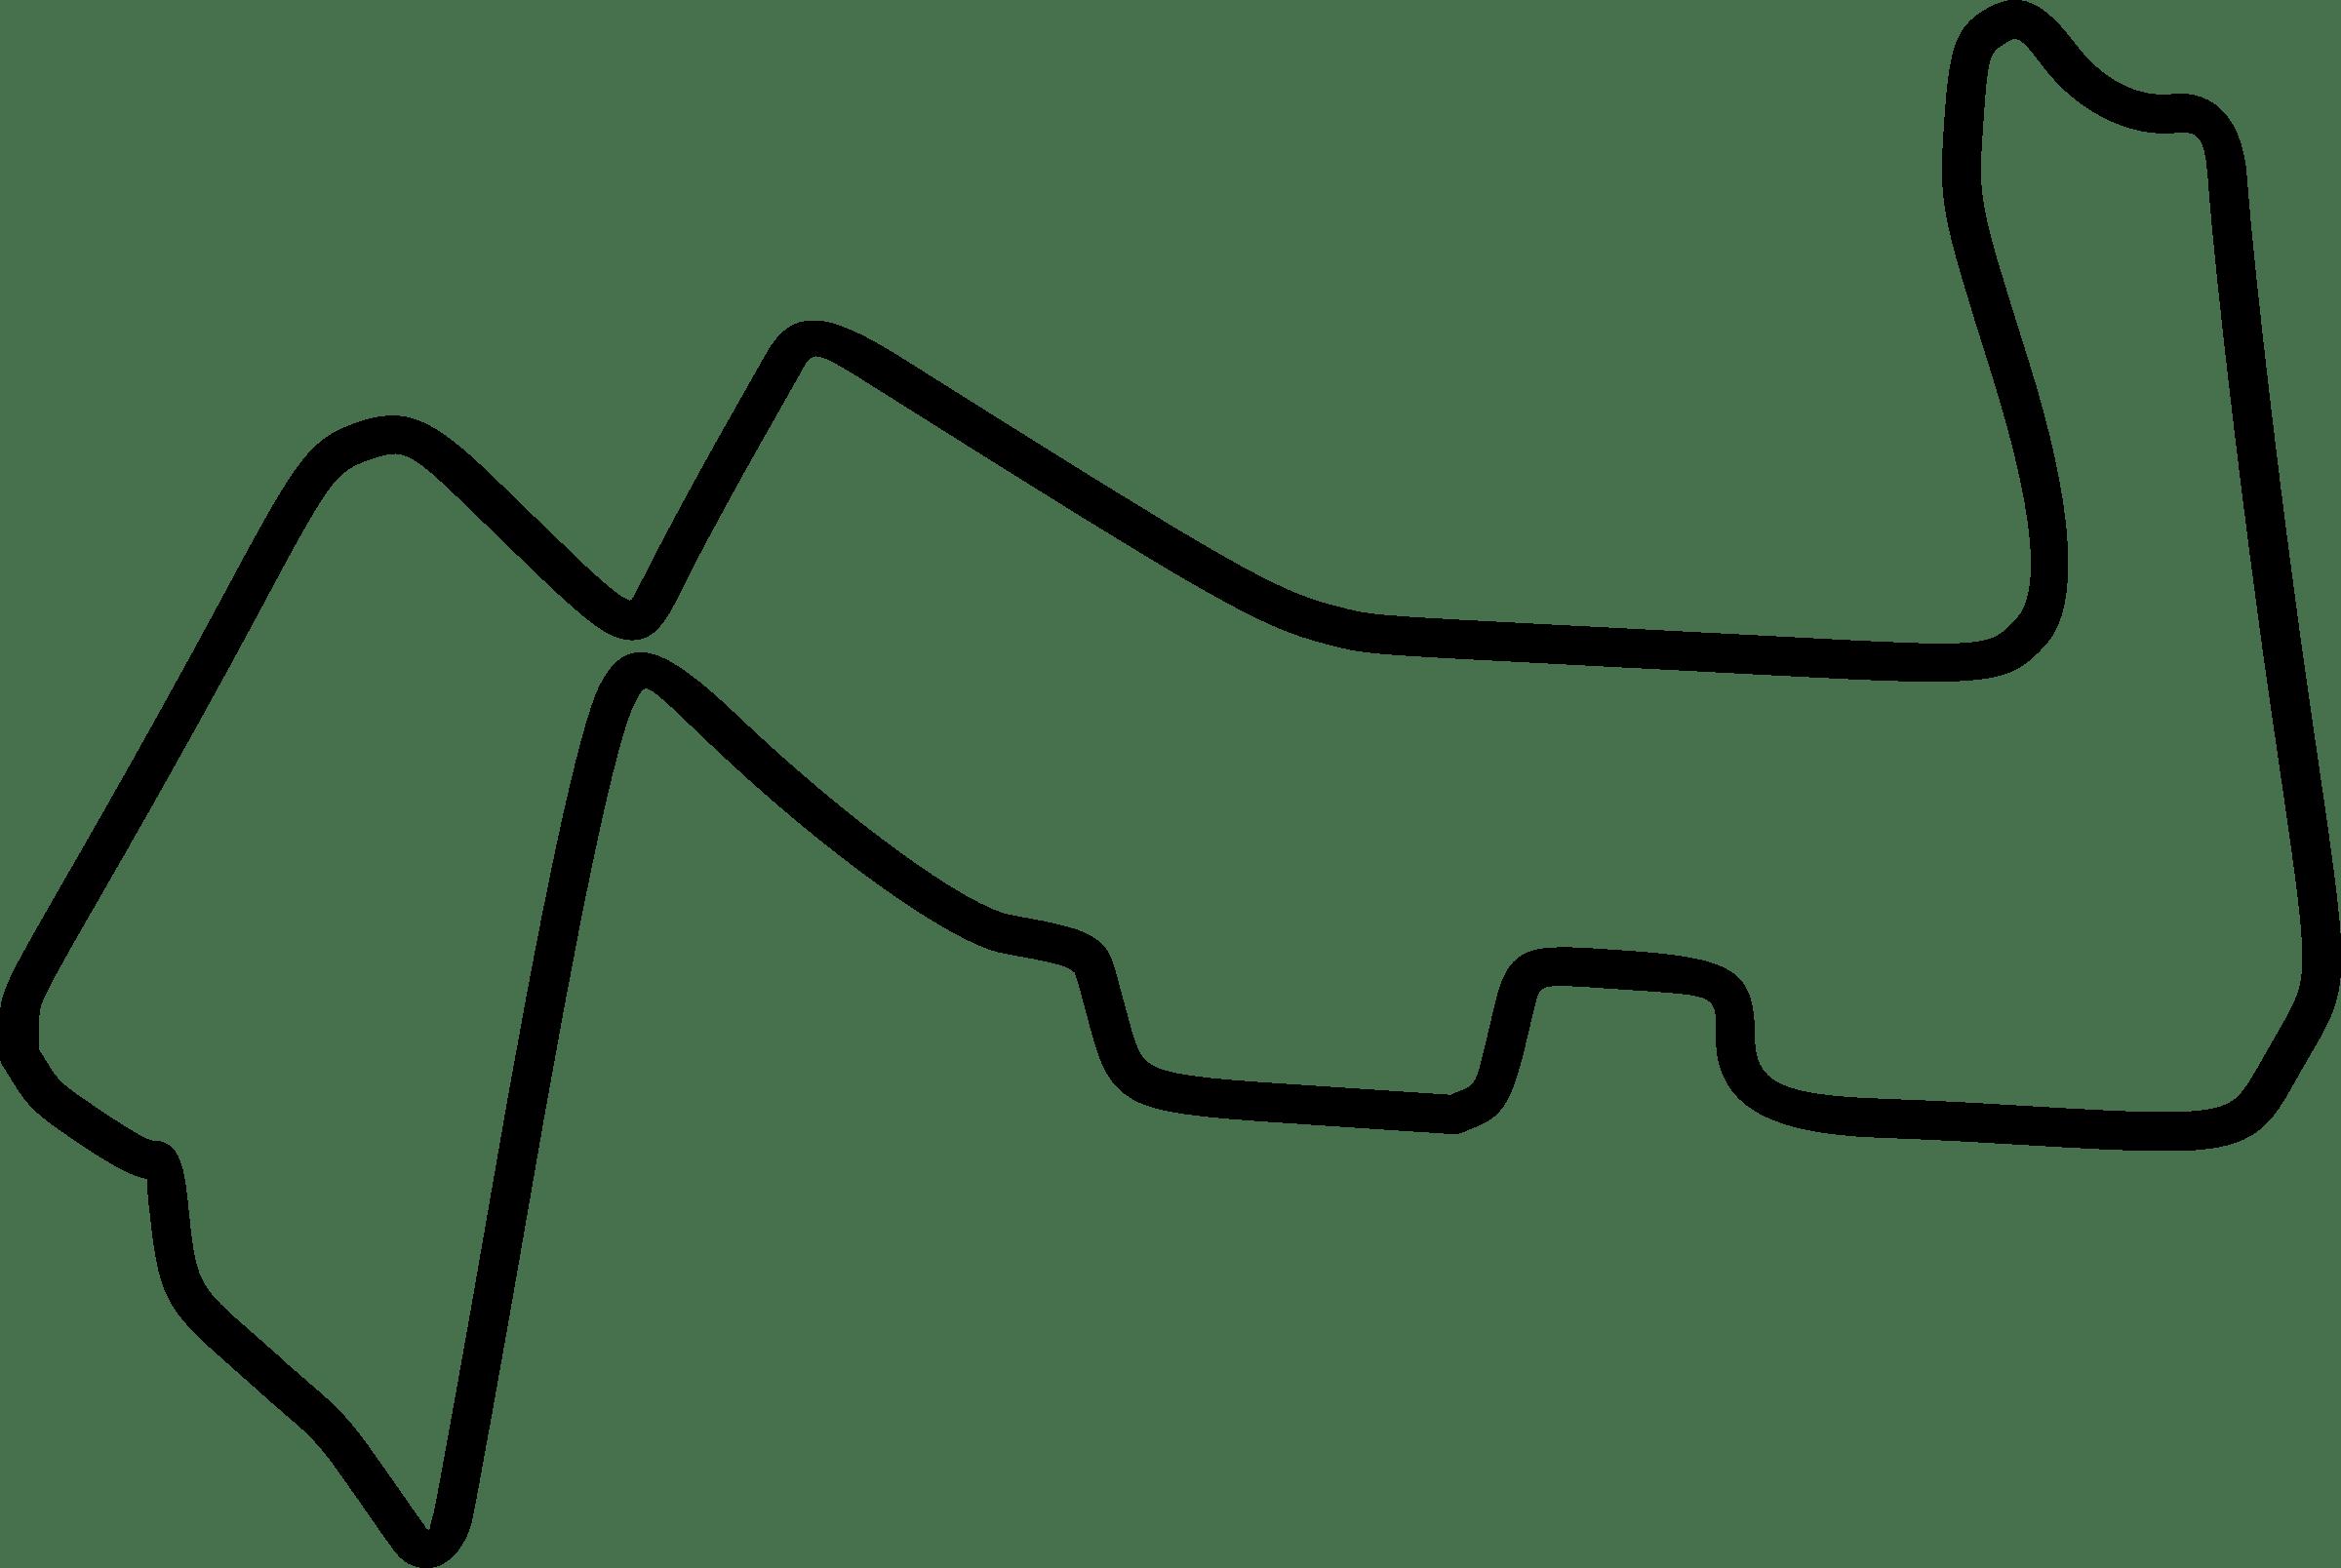 Track clipart outline, Track outline Transparent FREE for